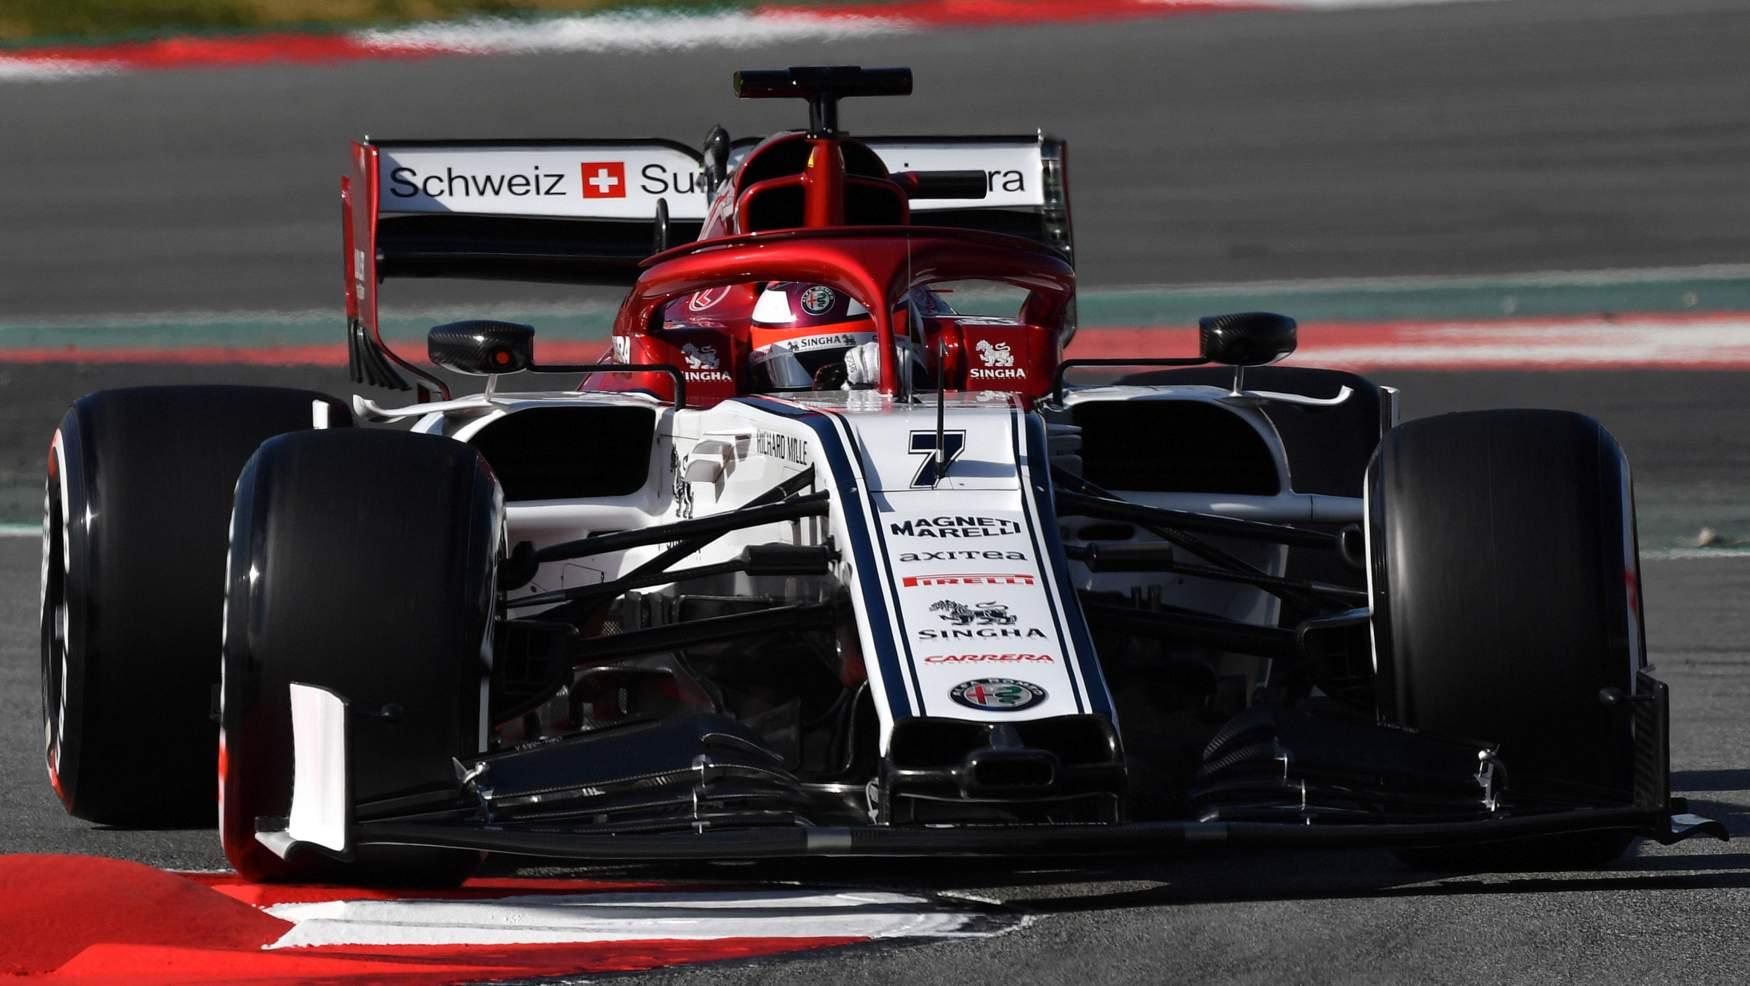 Botas wins 2019 Australian GP